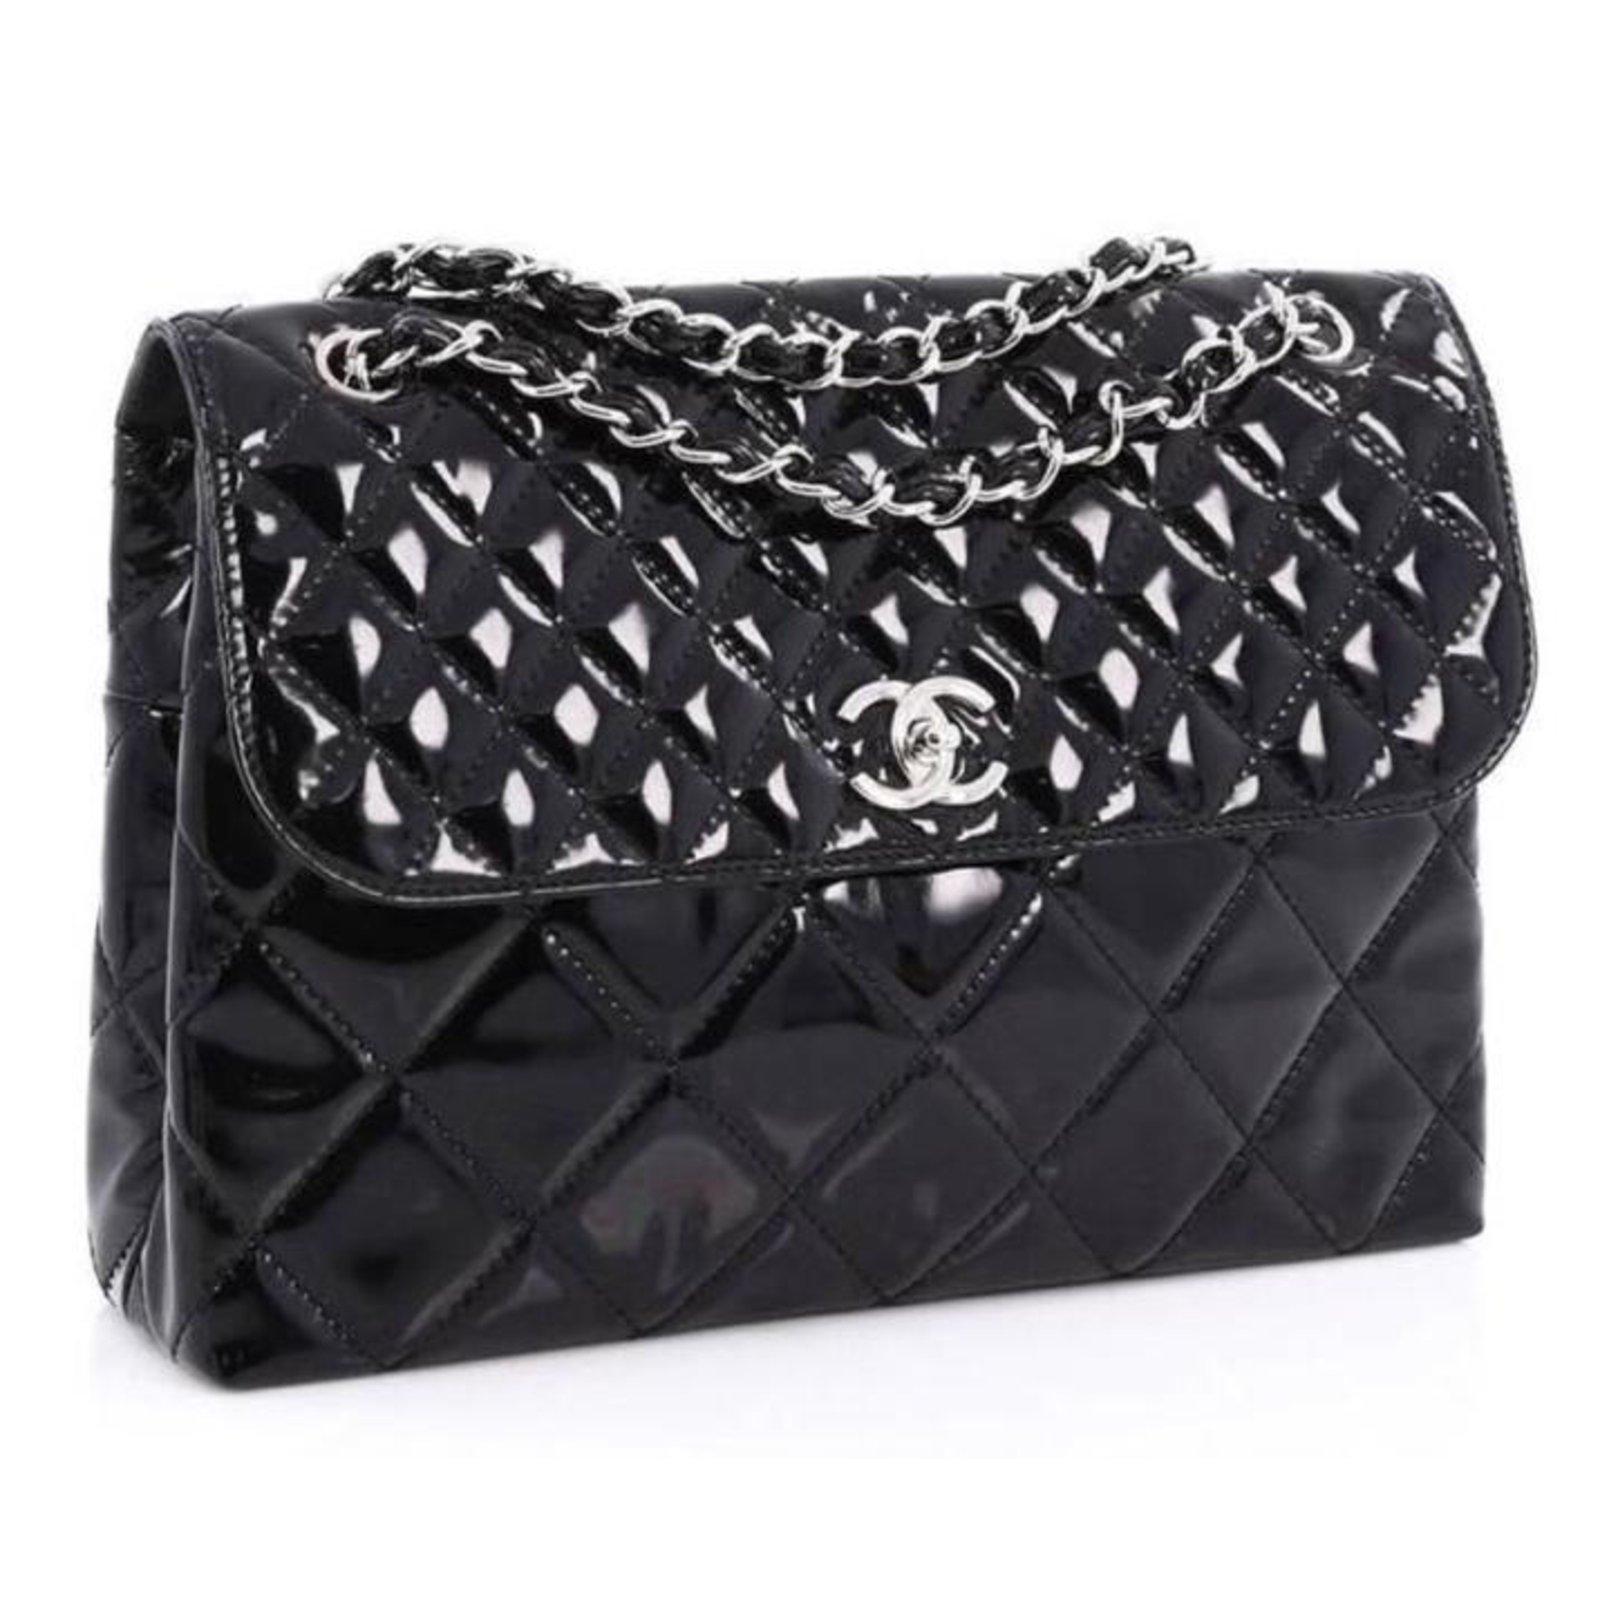 d40124d9f9cf Chanel Business flap maxi bag Handbags Patent leather Black ref.73652